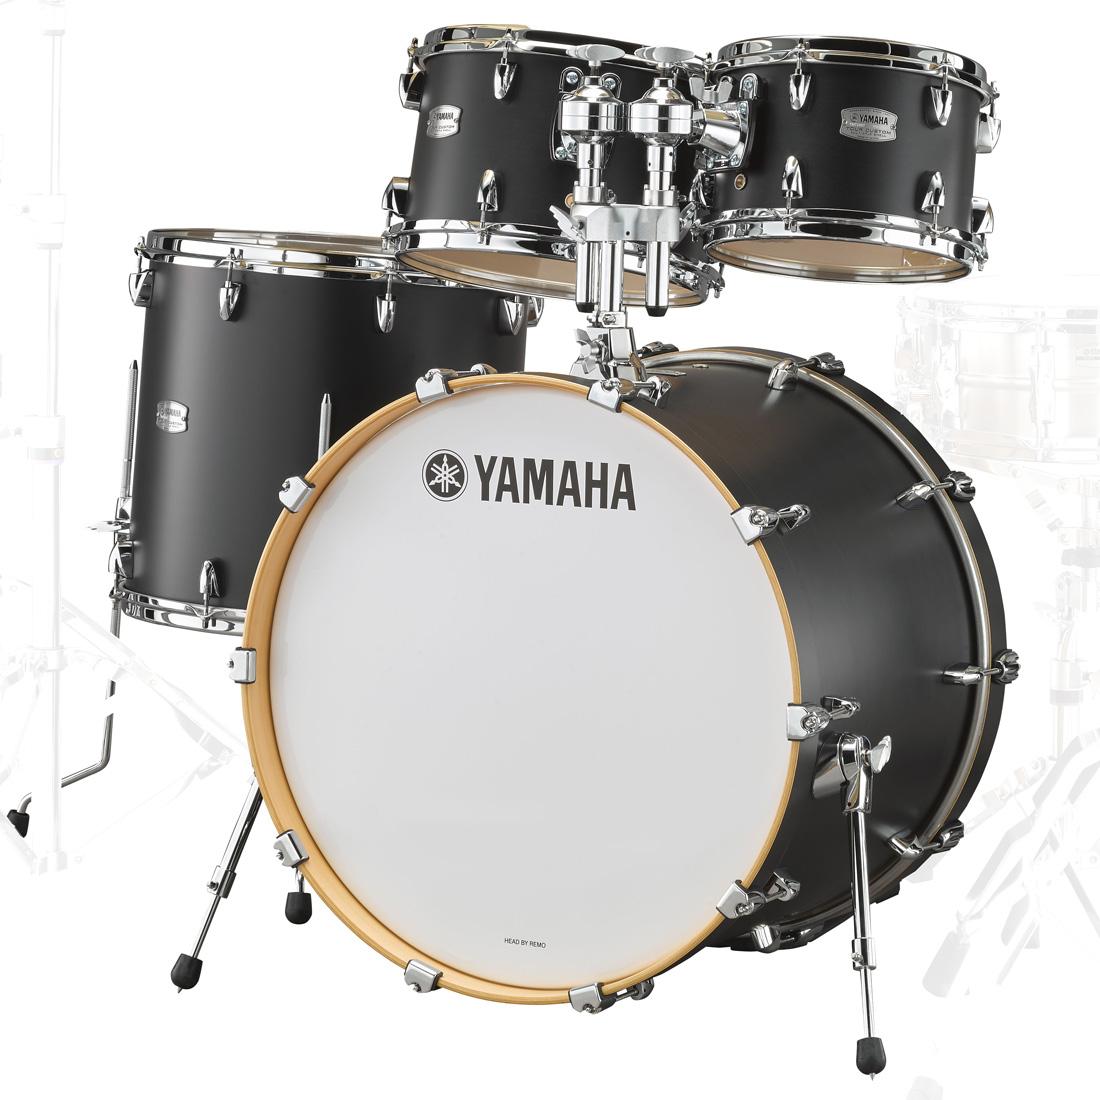 YAMAHA/ TMP2F4LCS Custom ヤマハ 22BD Tour Custom ドラムシェルパック 22BD Tour リコライスサテン【お取り寄せ商品】, オリジナルショップ ハセプロ:88893d8f --- officewill.xsrv.jp